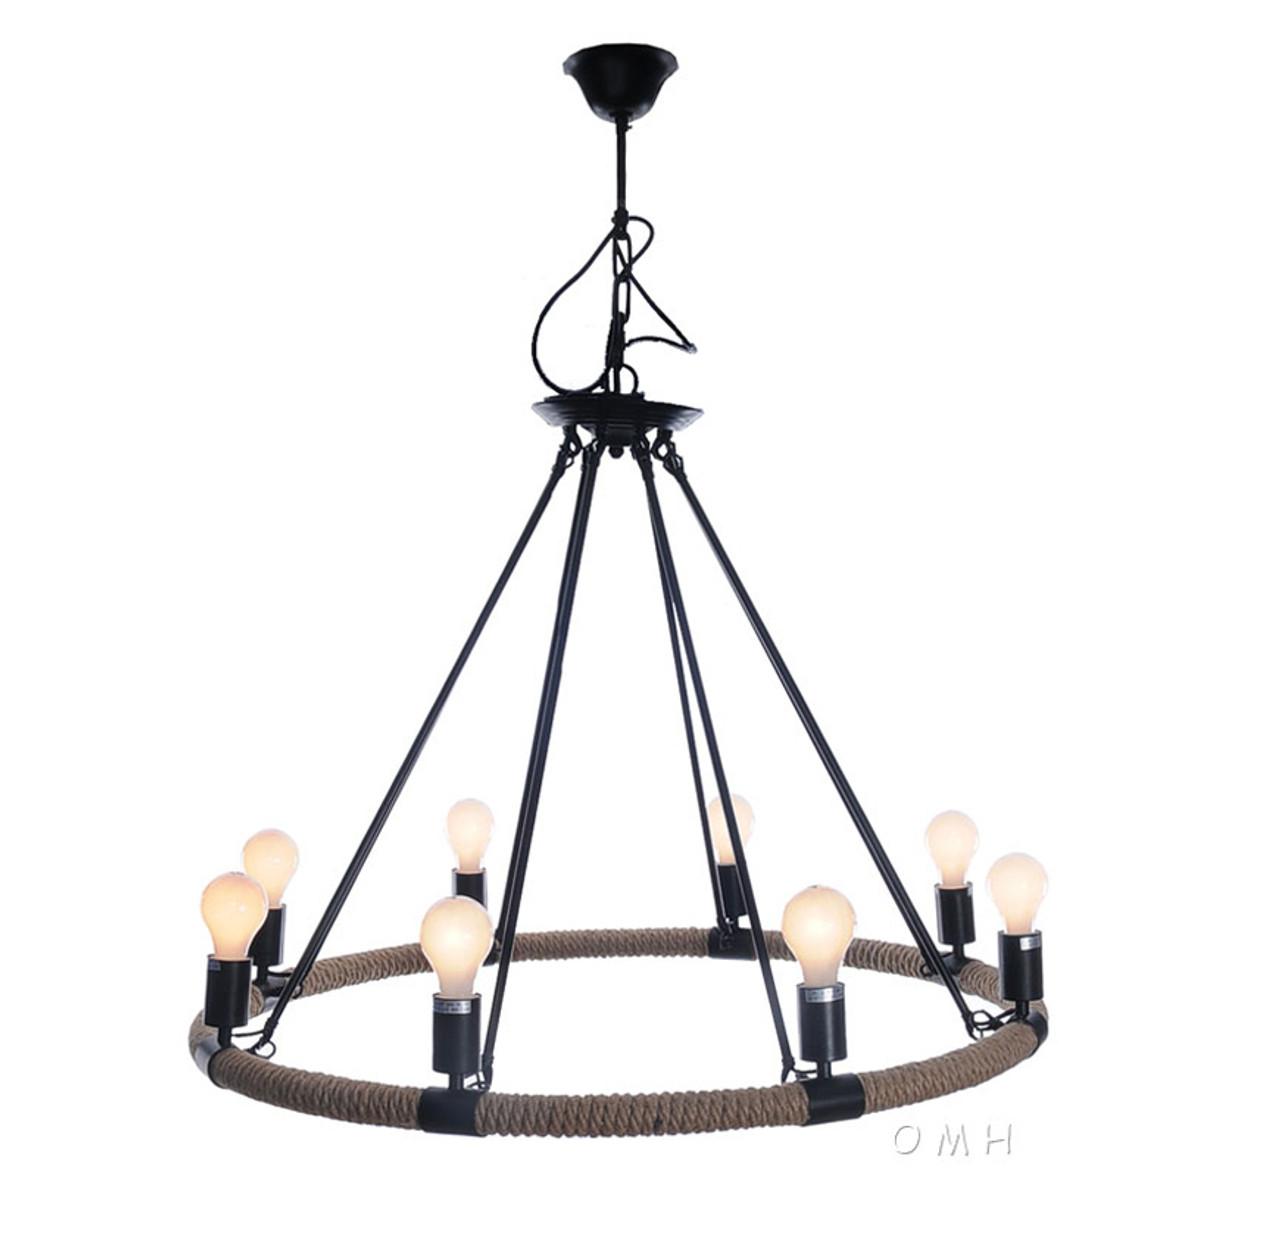 Nautical Rope Pendant Hanging Lamp Chandelier Lighting 37